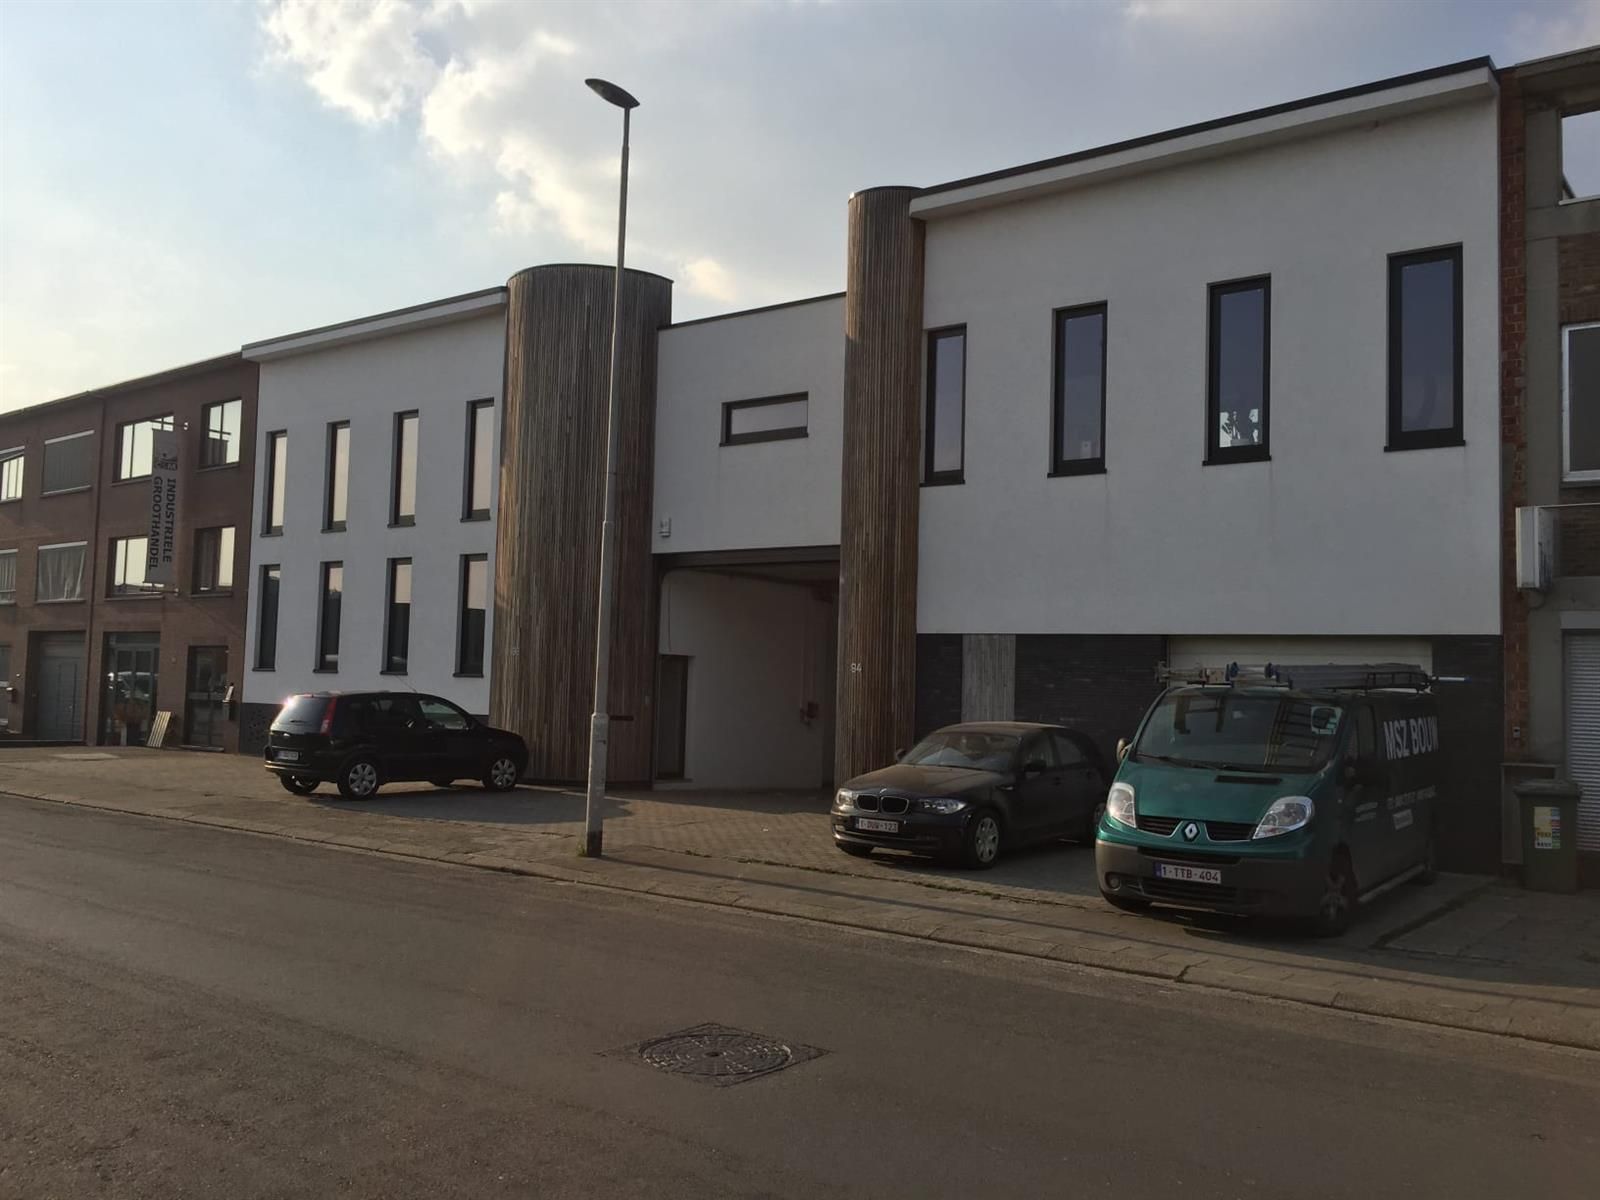 kantoor te huur K003 - Middelmolenlaan 96, 2100 Antwerpen Deurne, België 18